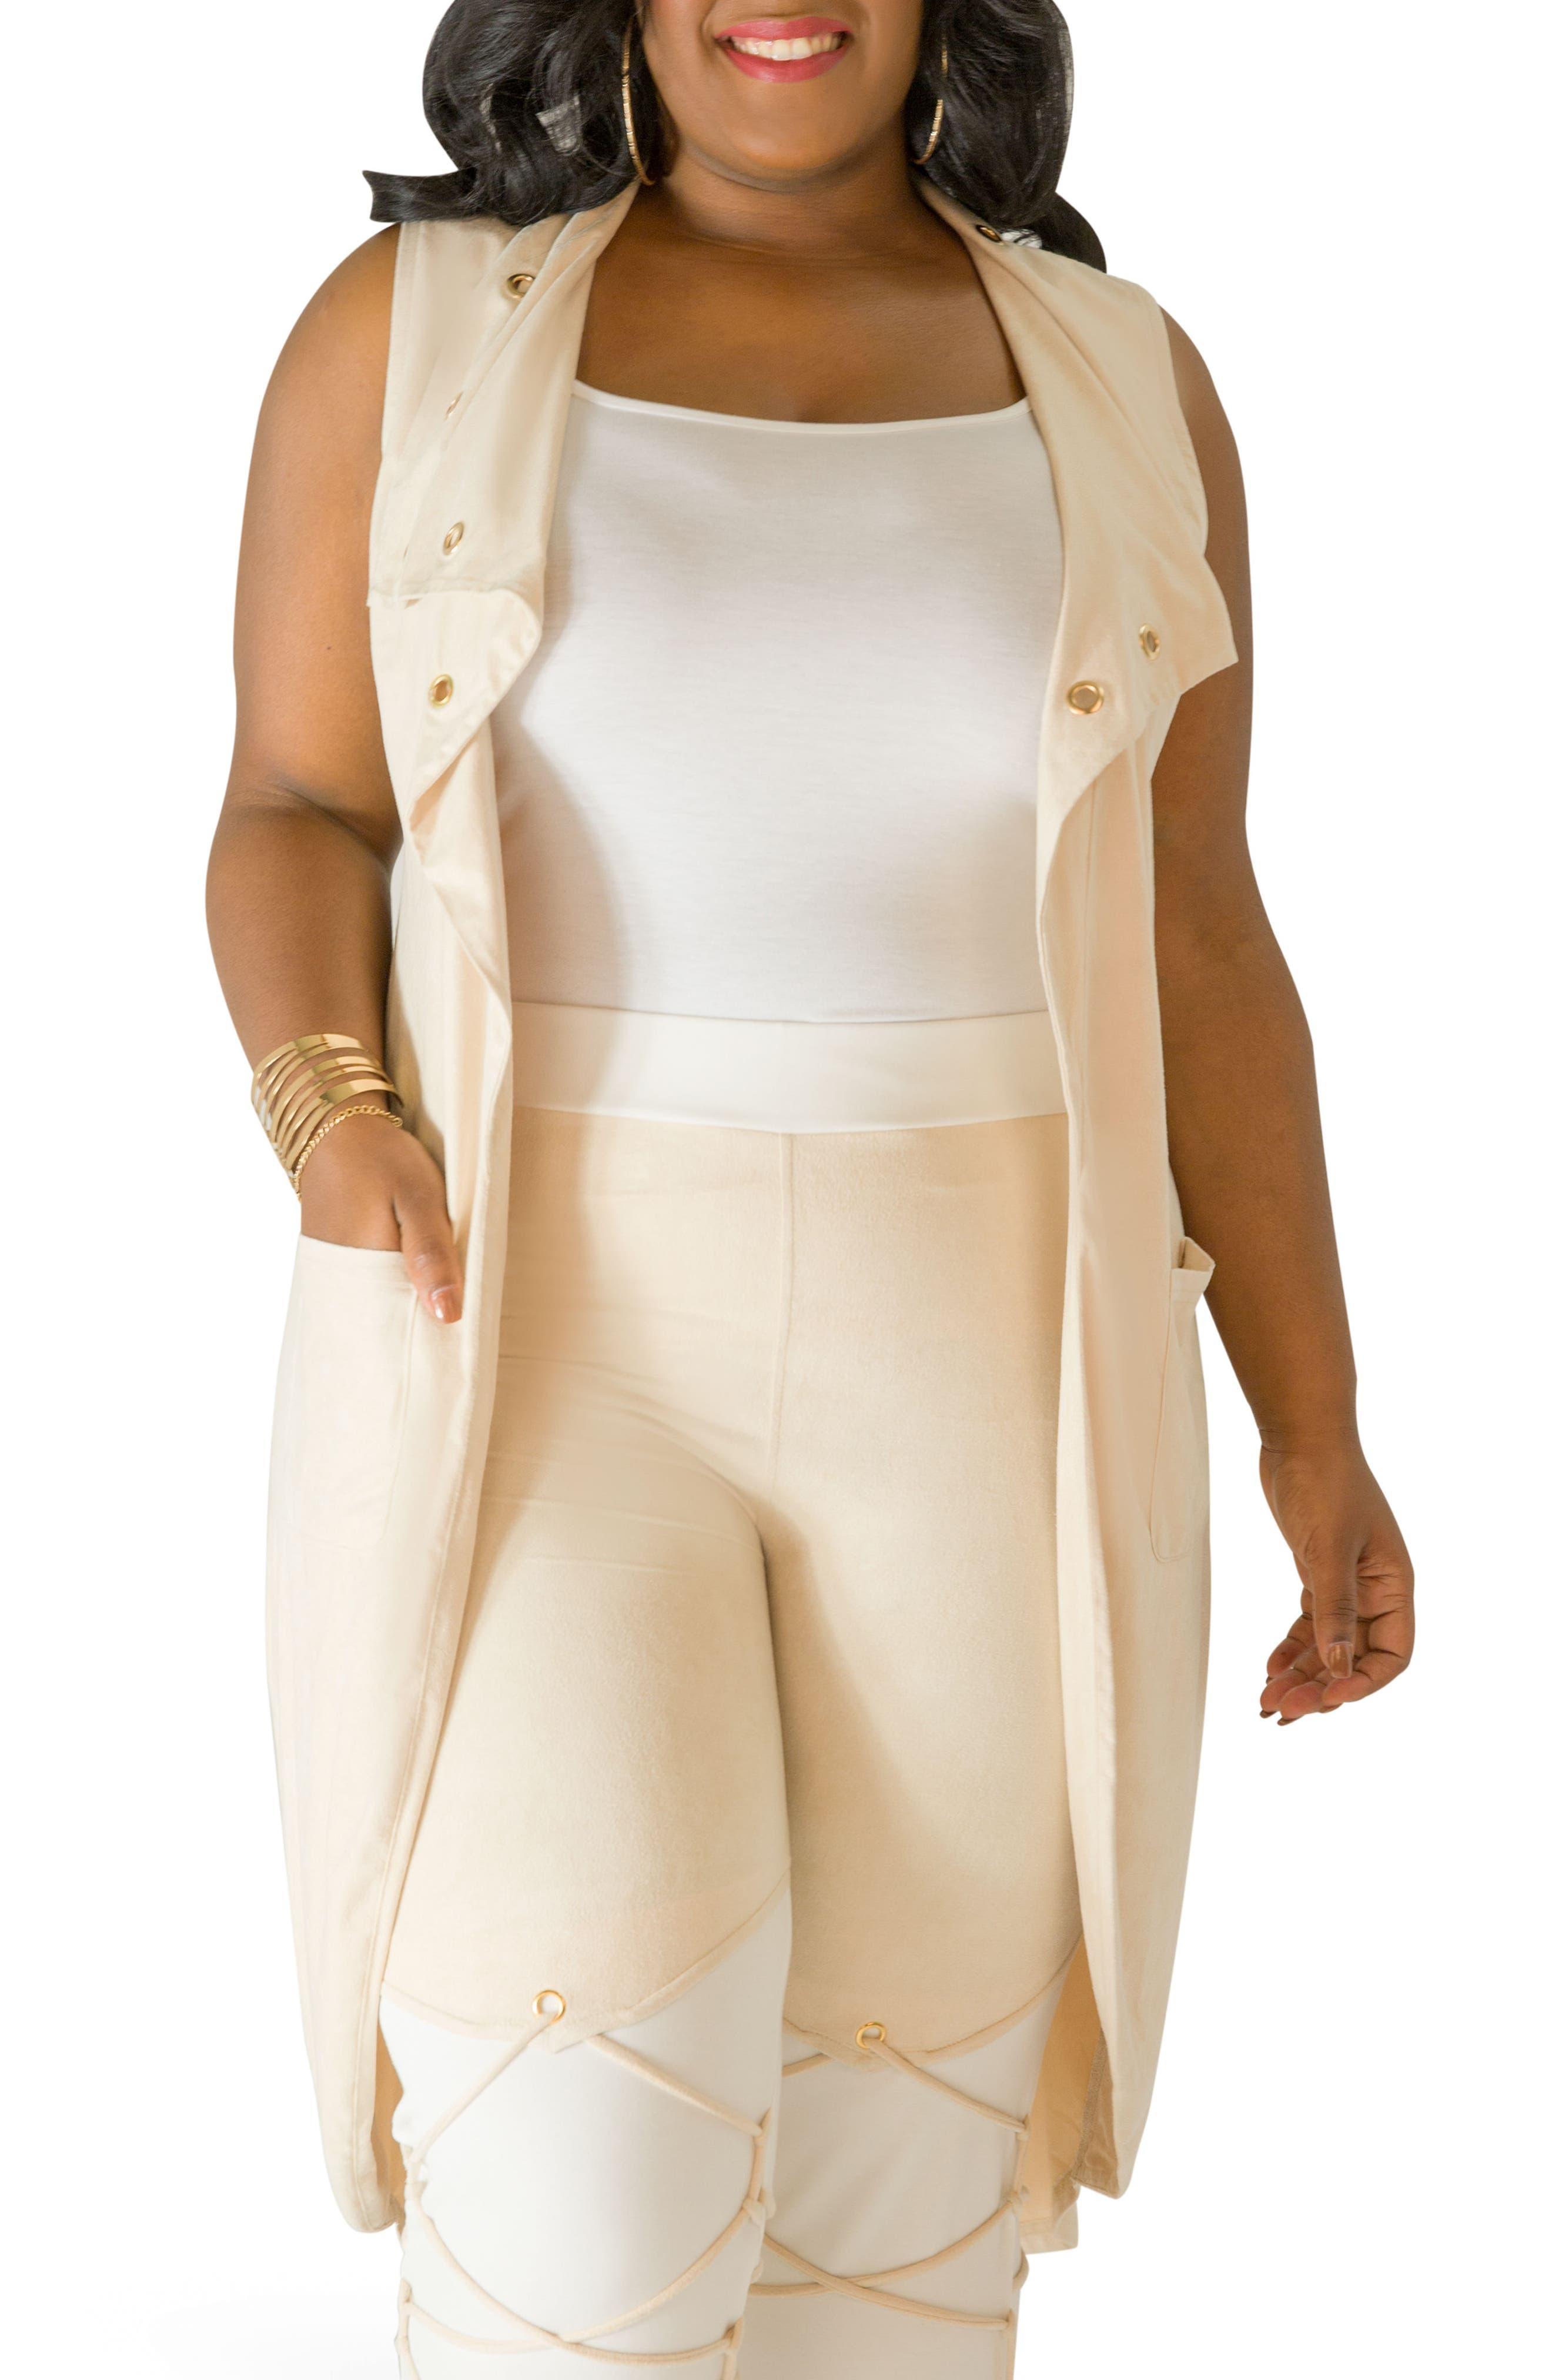 Alternate Image 1 Selected - Poetic Justice Kelis Long Faux Suede Vest (Plus Size)